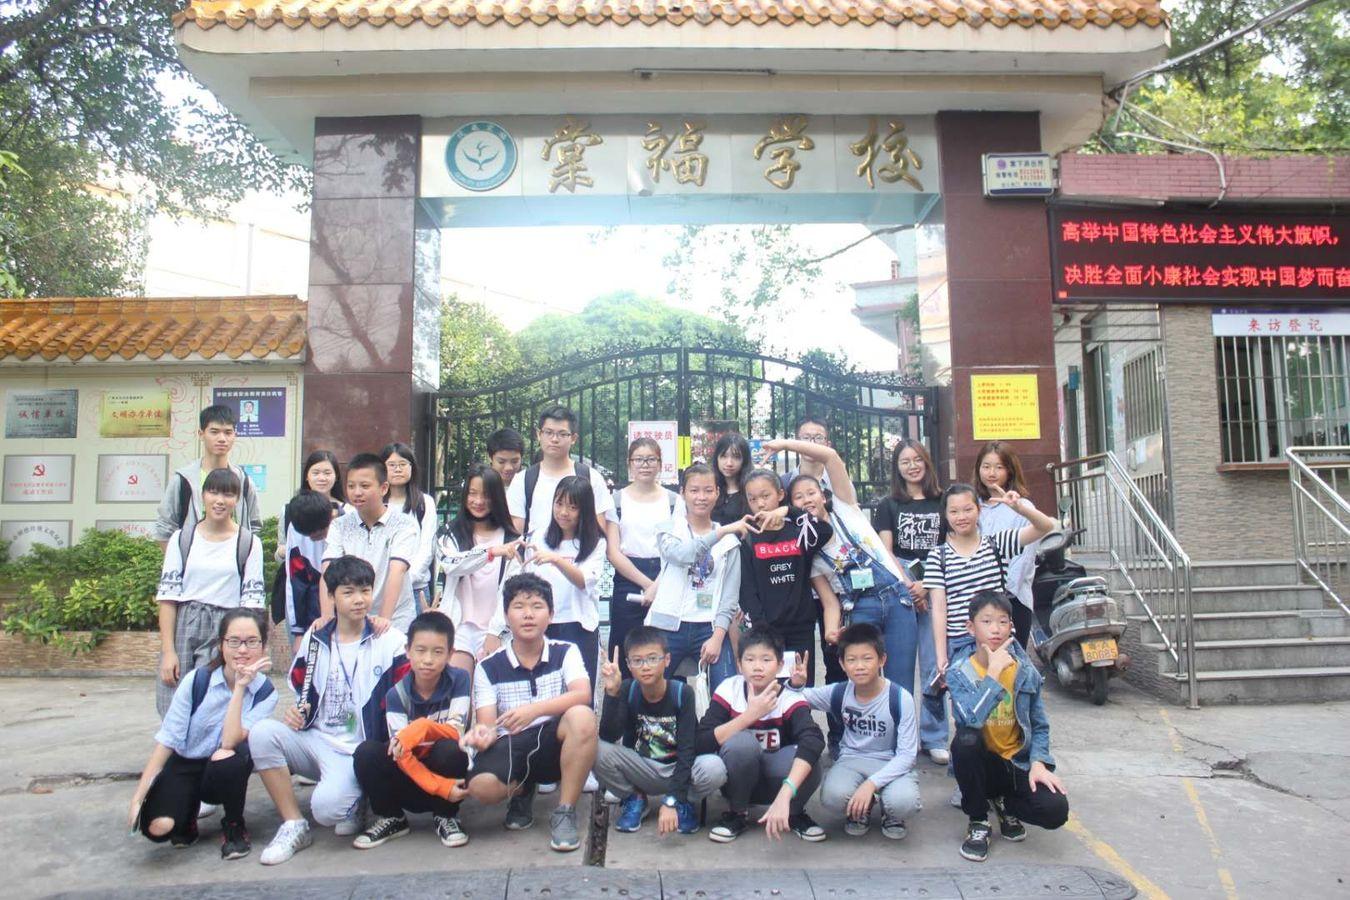 Embrace 3.0 - Helping Urban Marginal Group